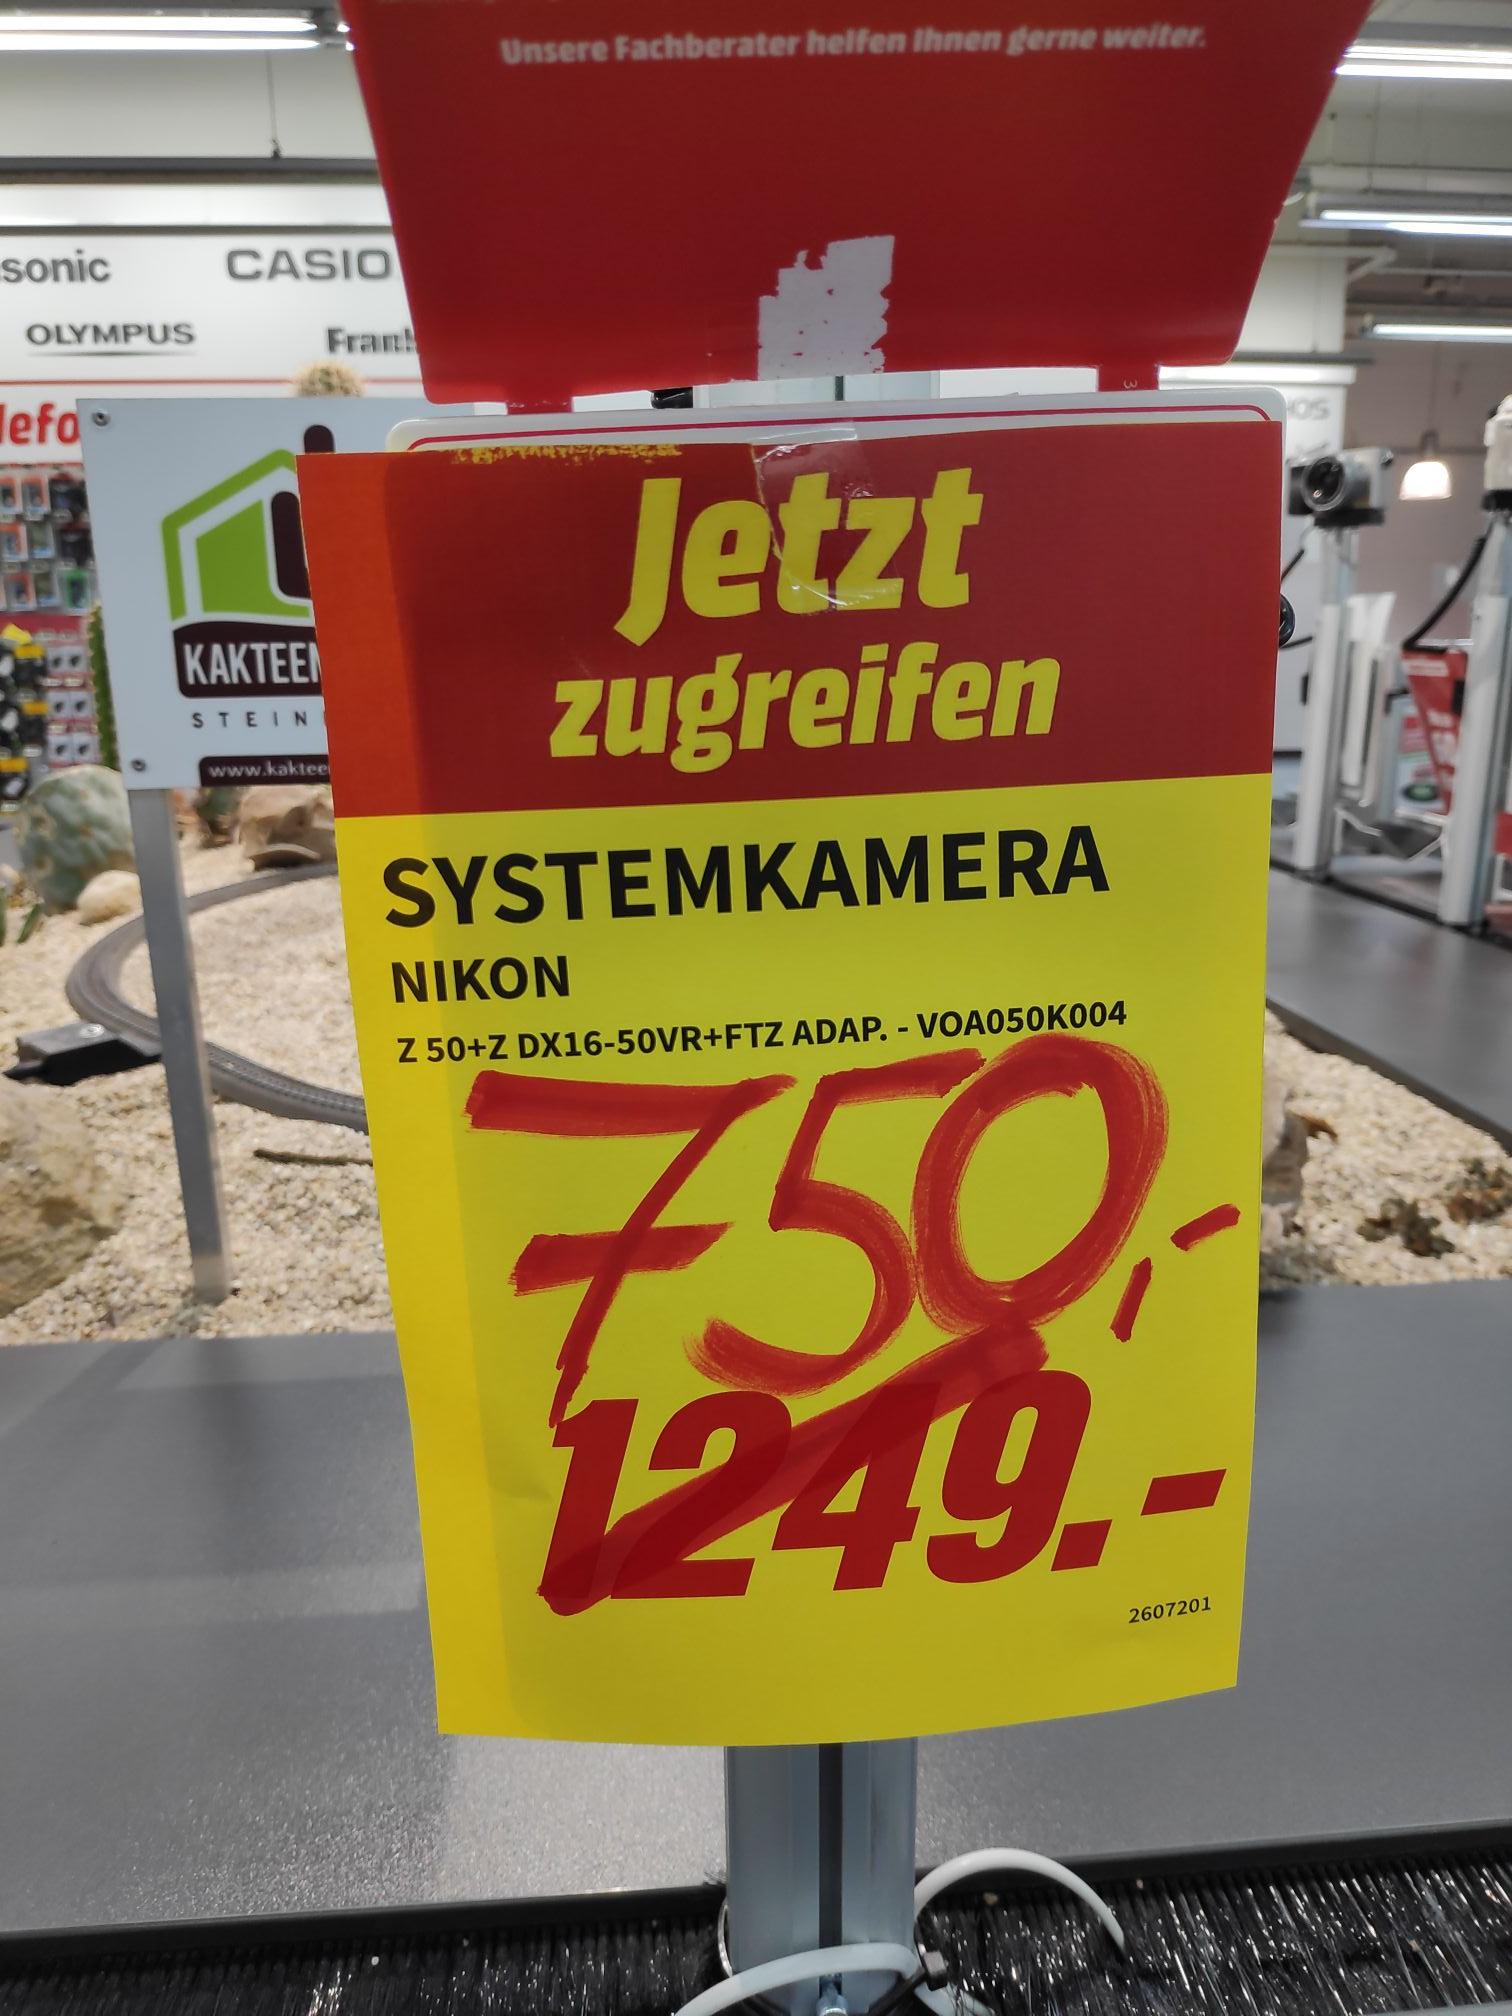 LOKAL{Landau} Nikon Z50+16-50VR+FTZ-Adapter bei MediaMarkt LD